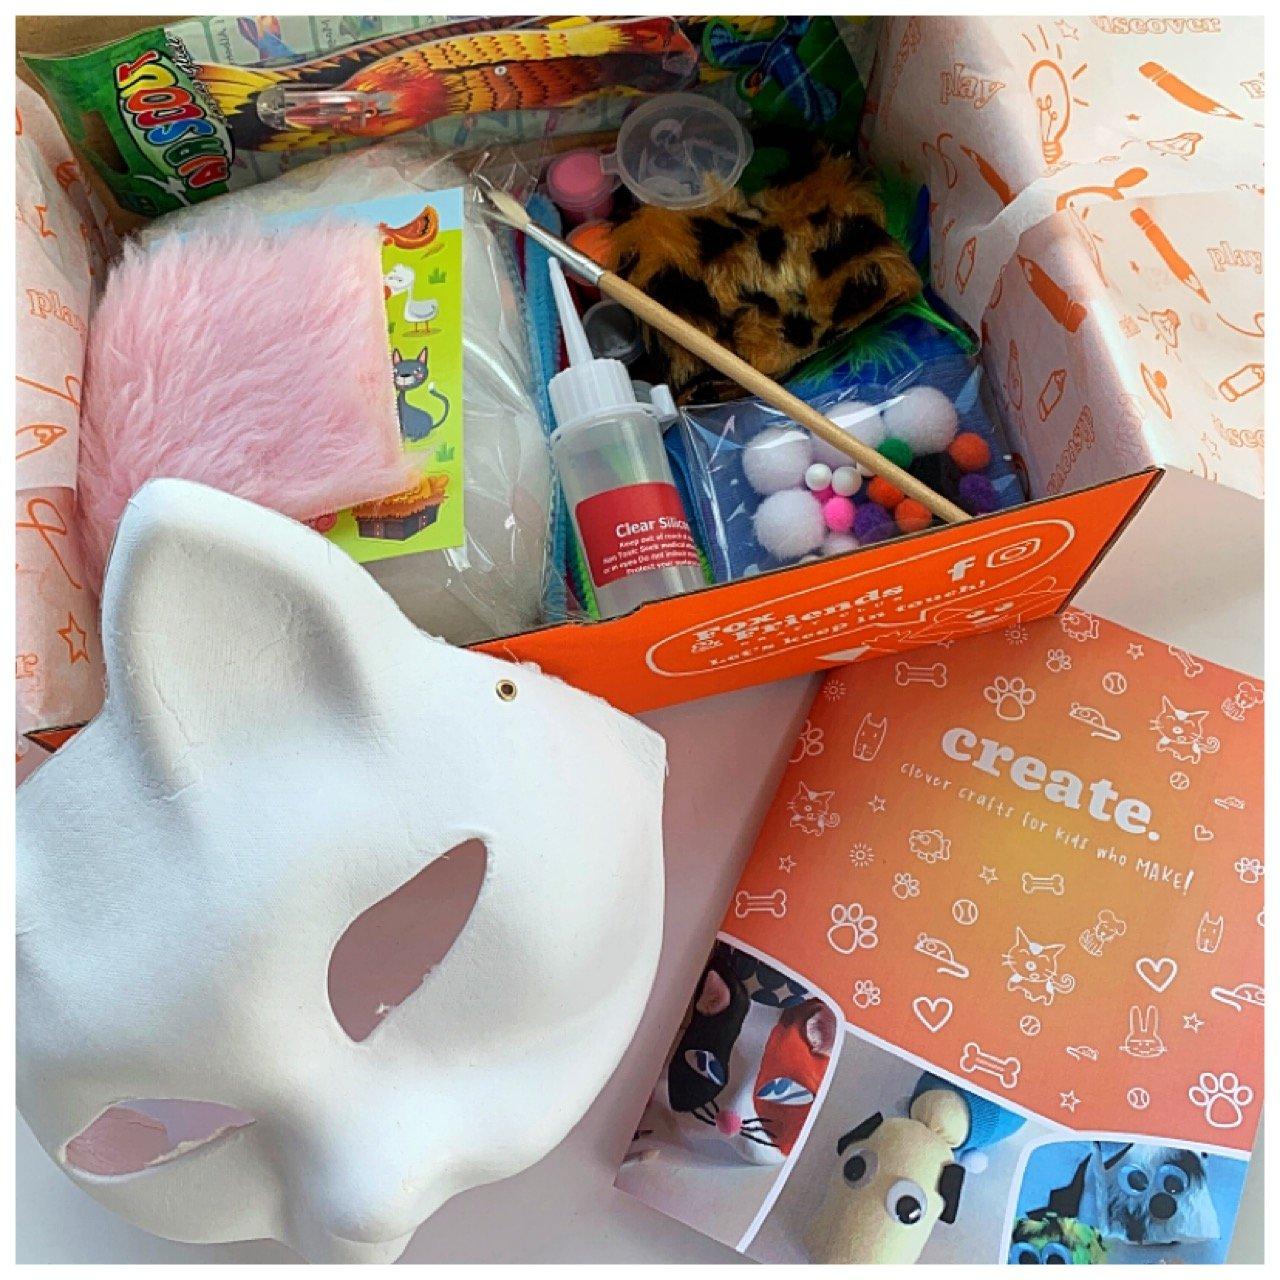 Creative and imaginative craft kits for kids